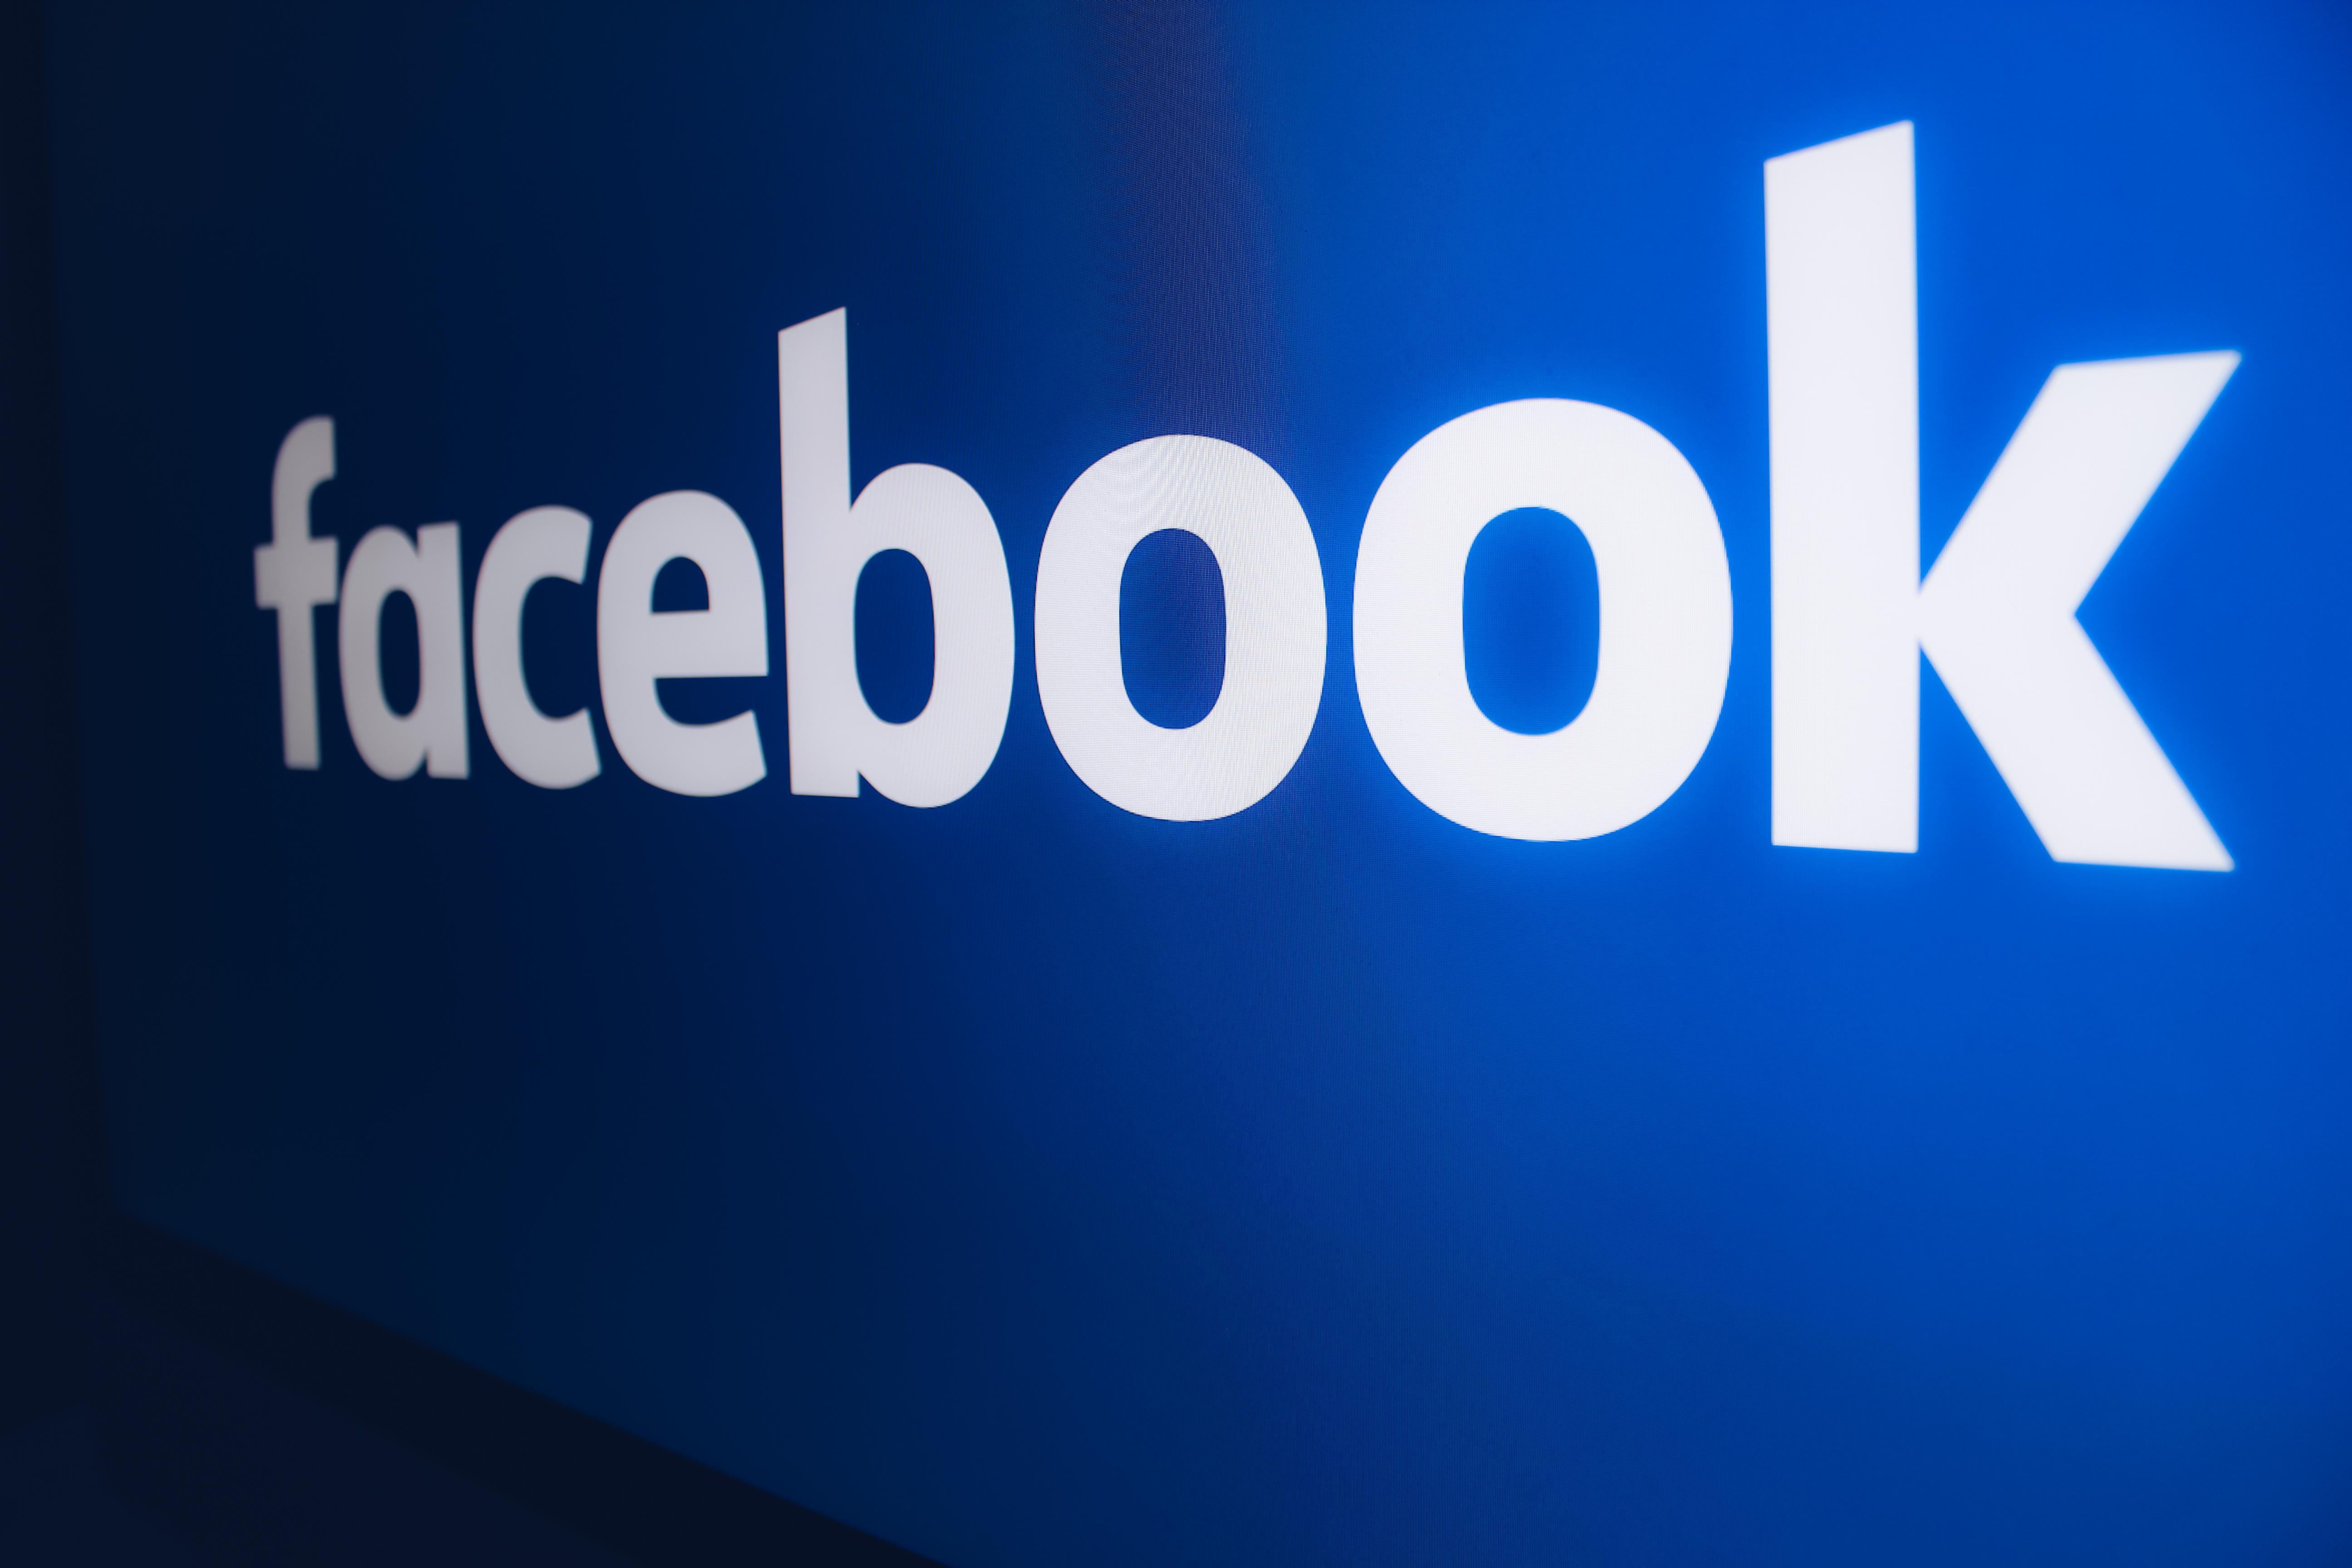 Facebook Requests Dismissal of Anti-Competitive Behaviour Case